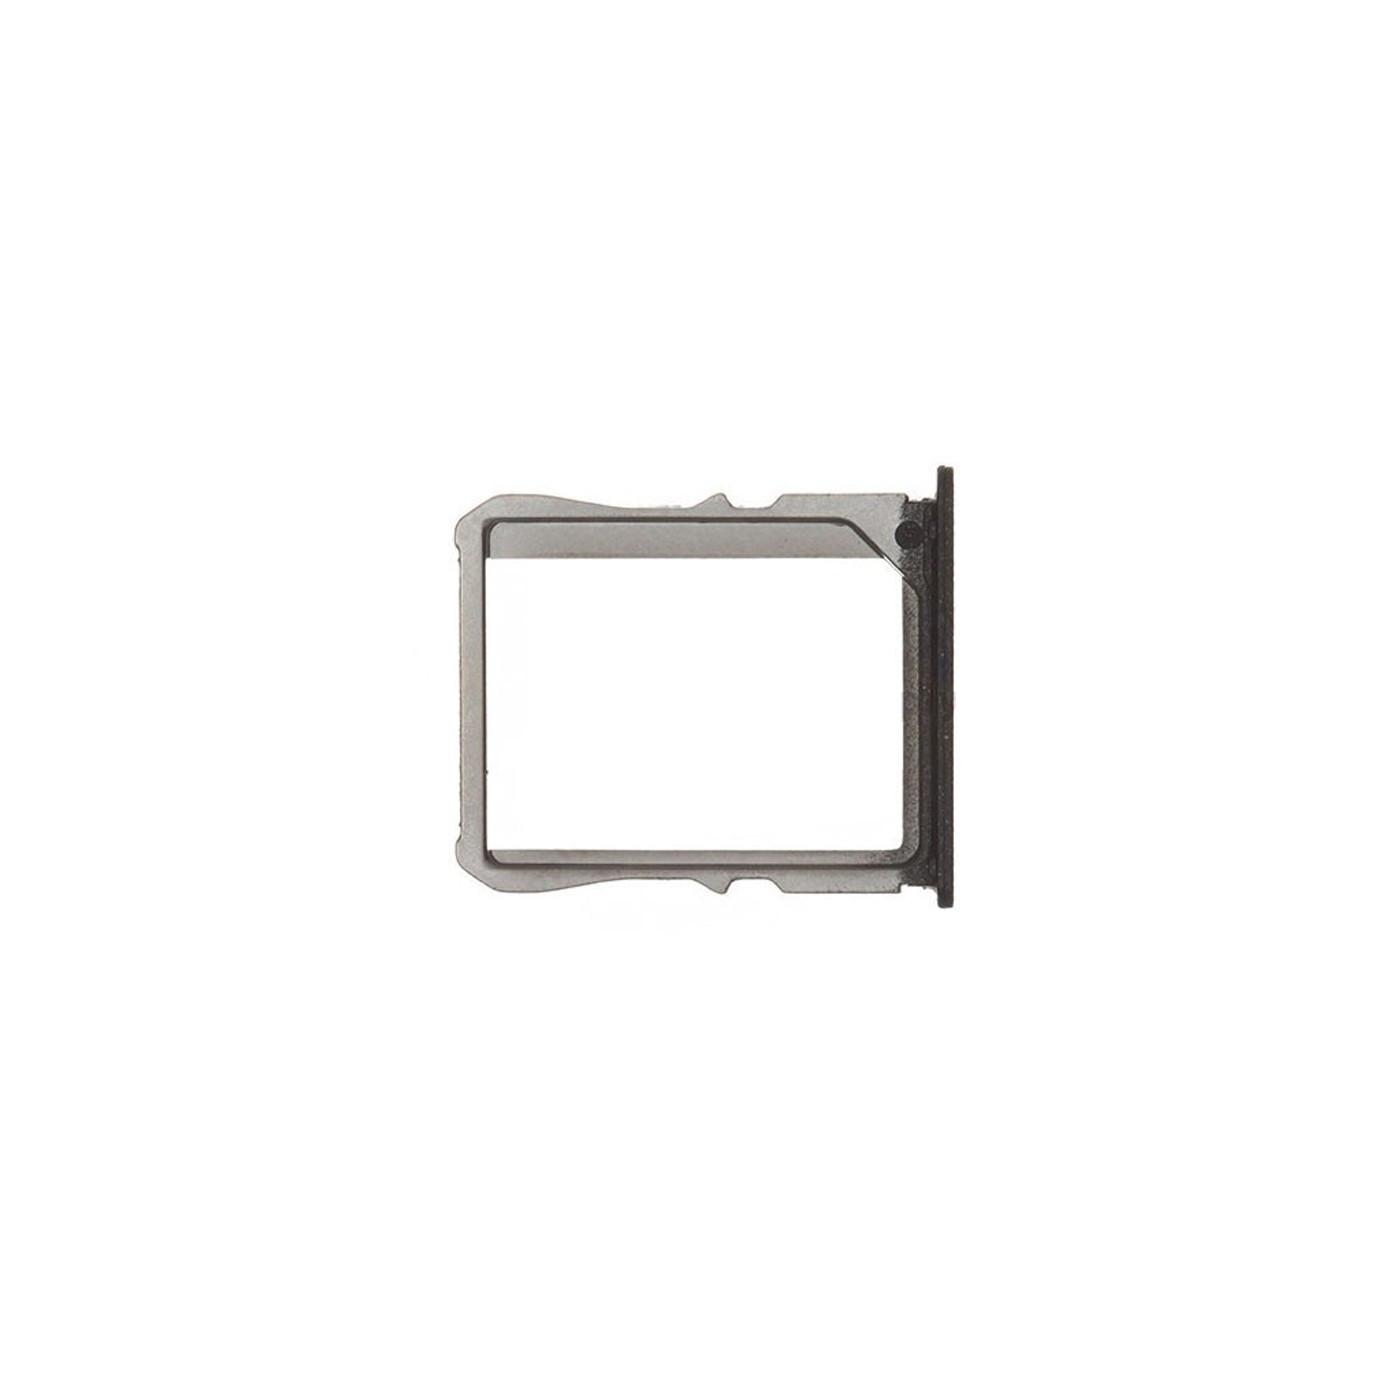 Porta scheda sim per Google Nexus 4 E960 slot carrello slitta